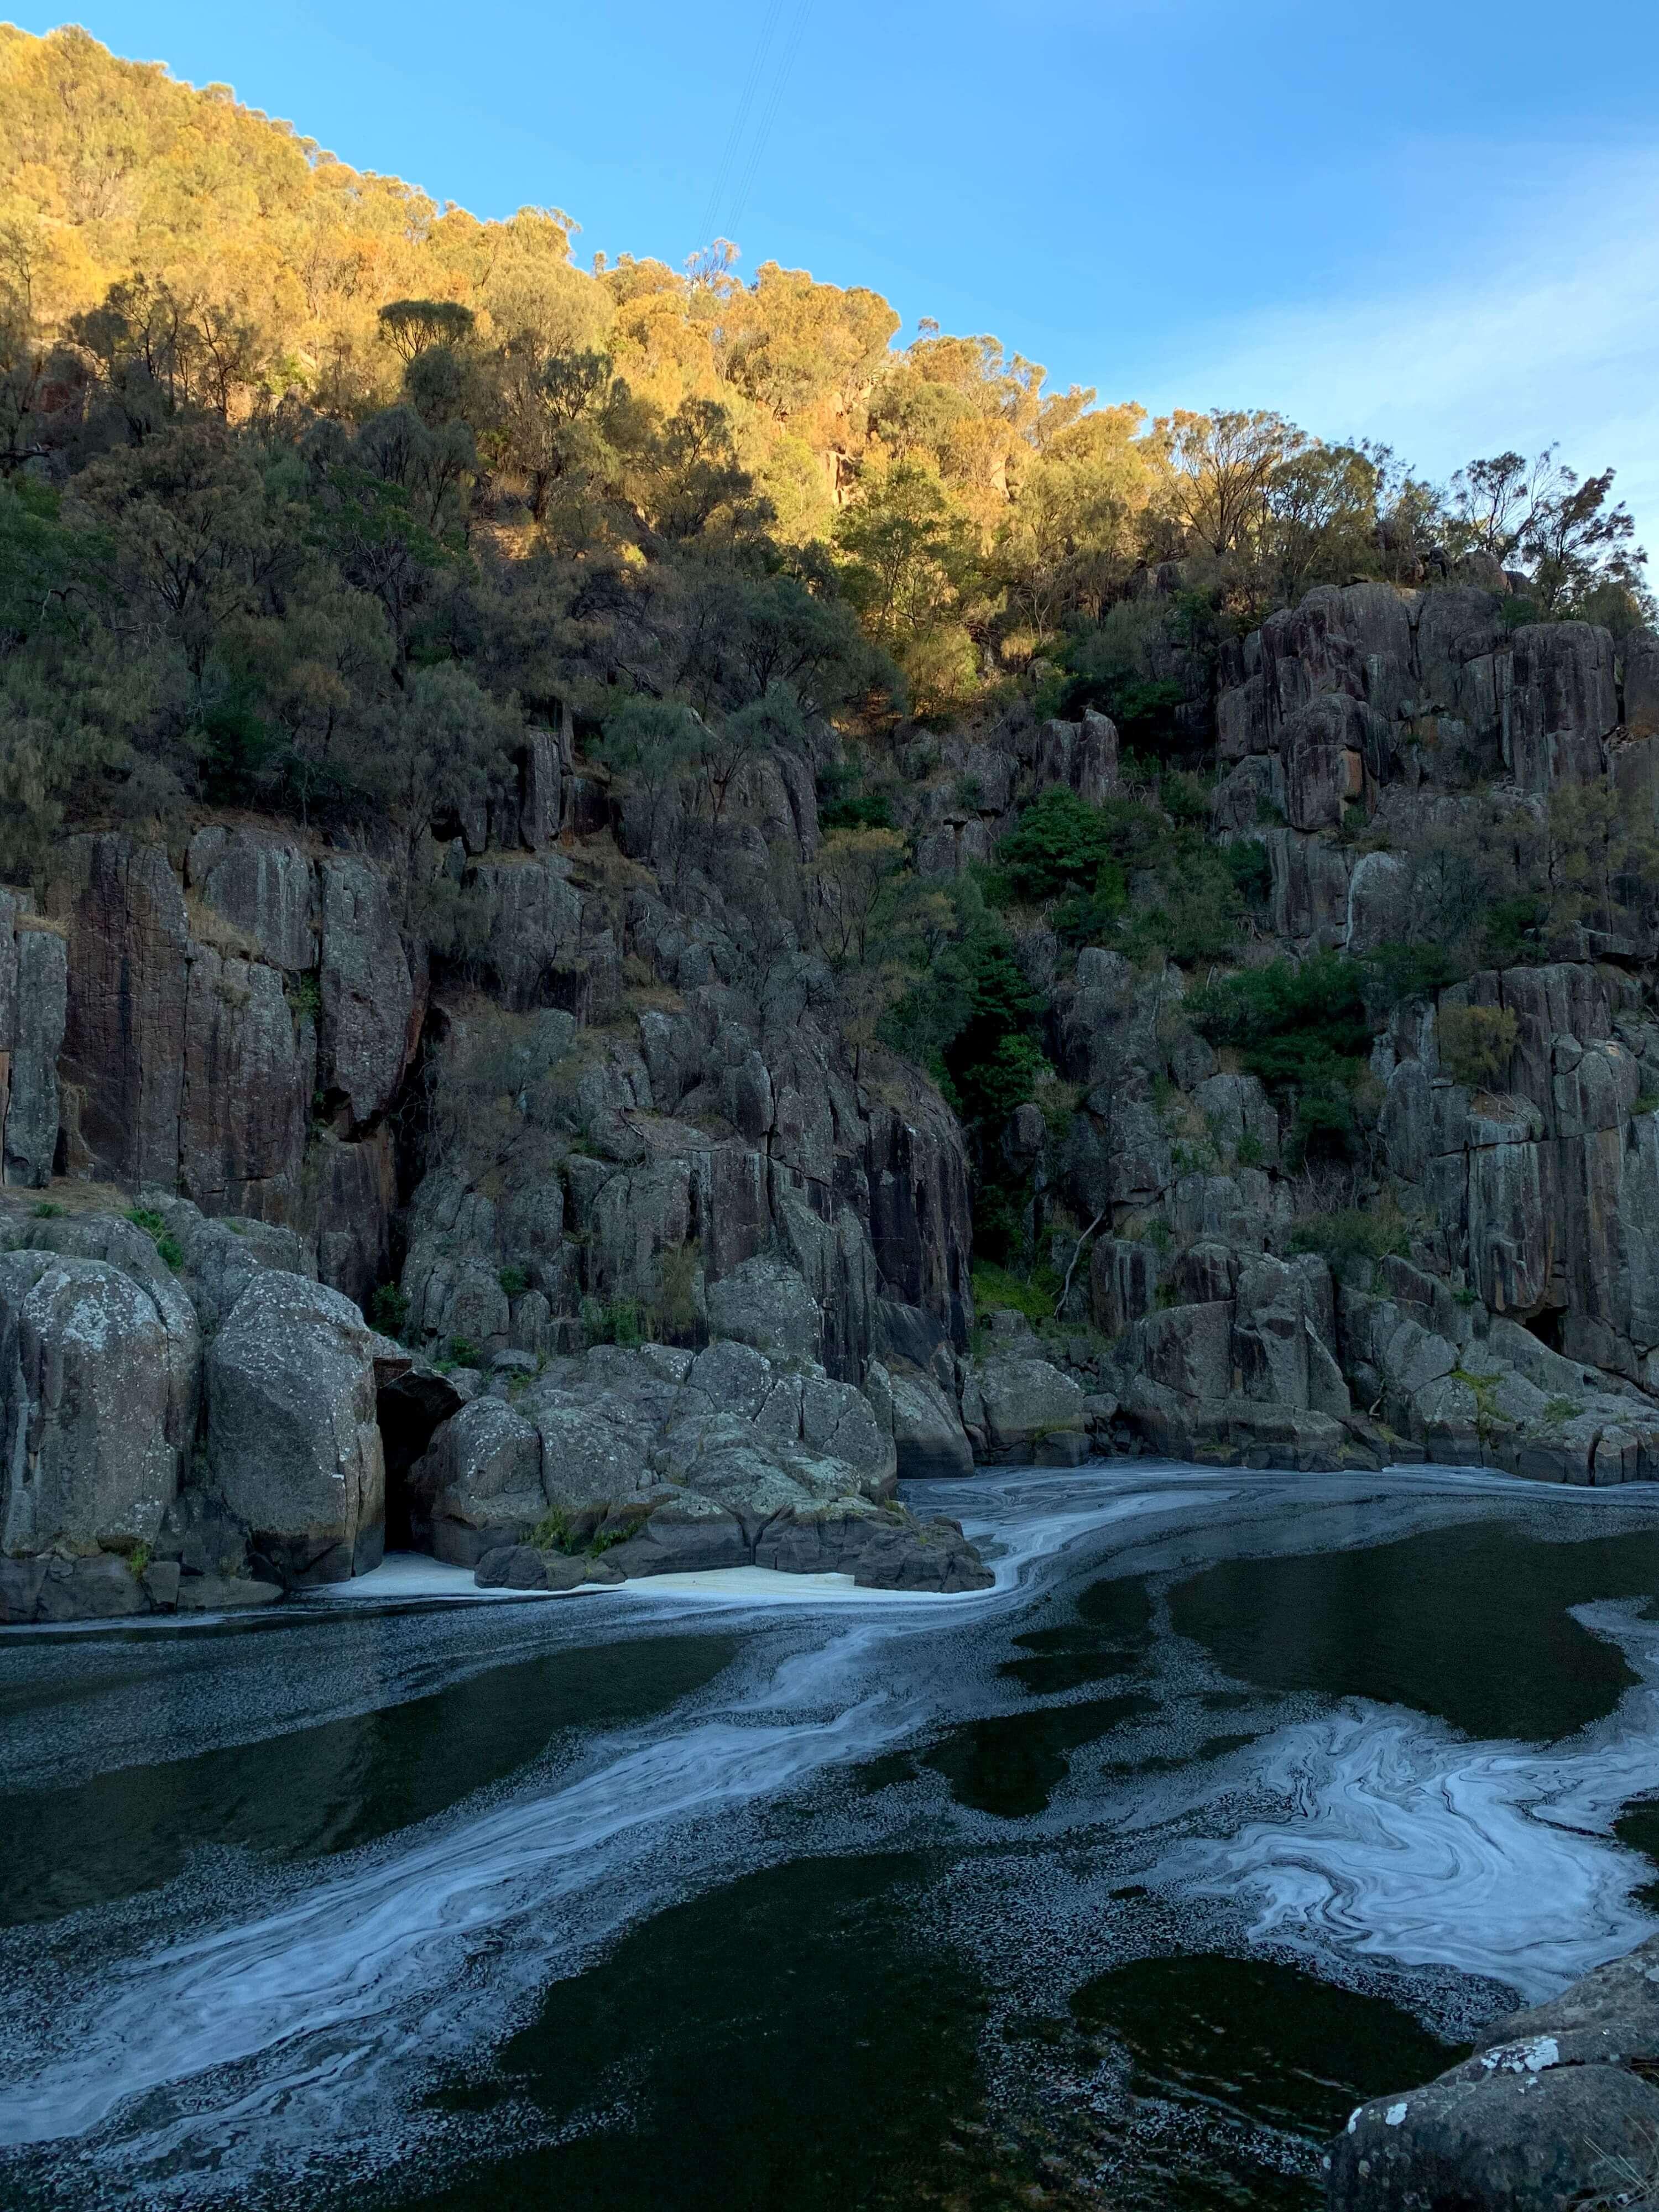 Tamar river foaming on the edges - The Cataract Gorge in Launceston, TasmaniaTamar River